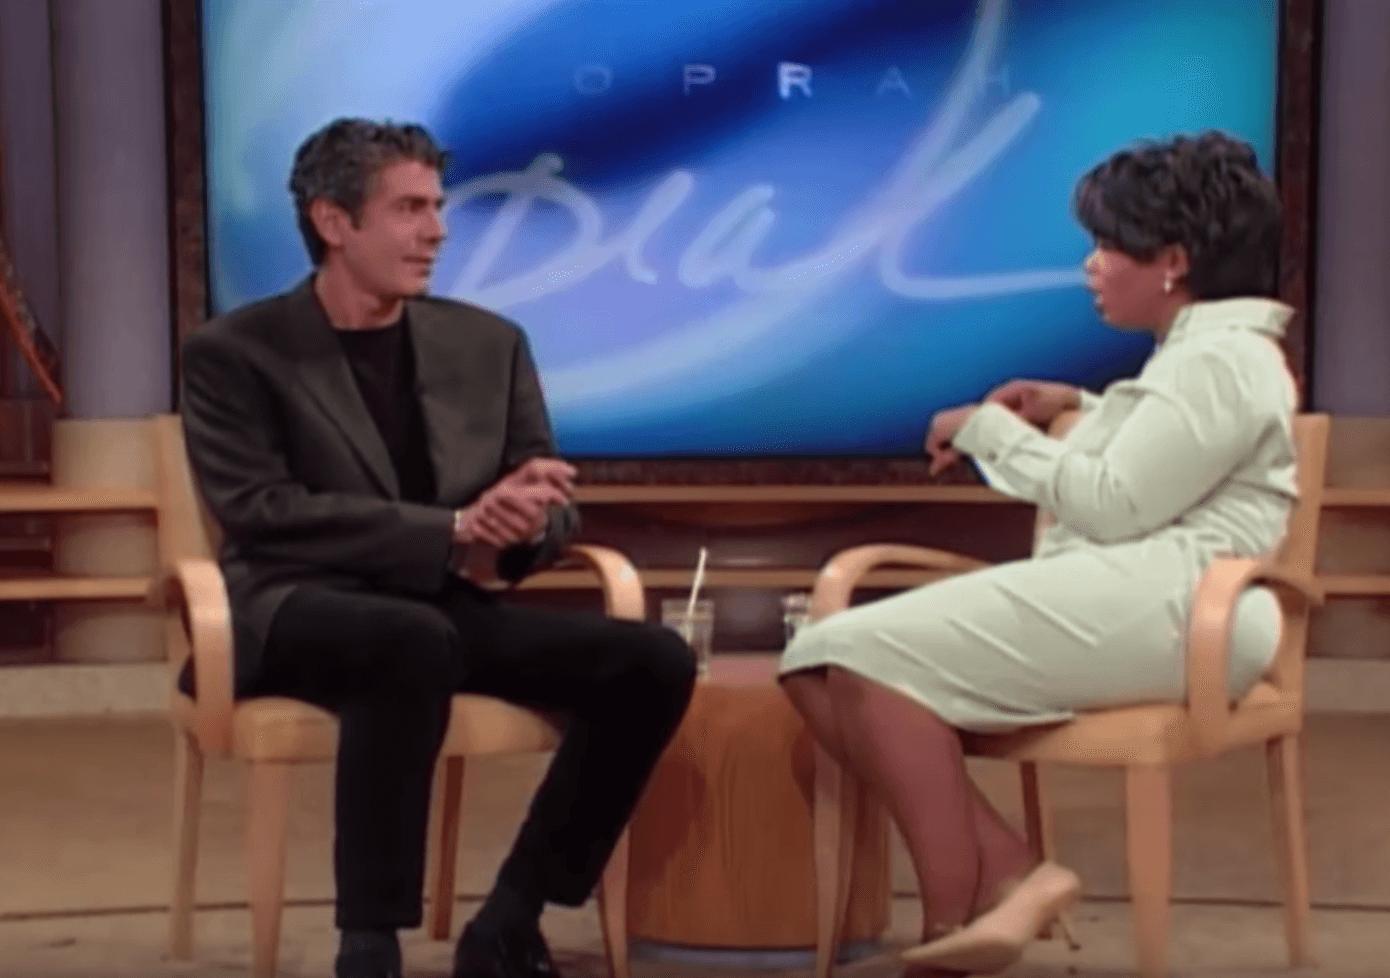 Anthony Bourdain and Oprah